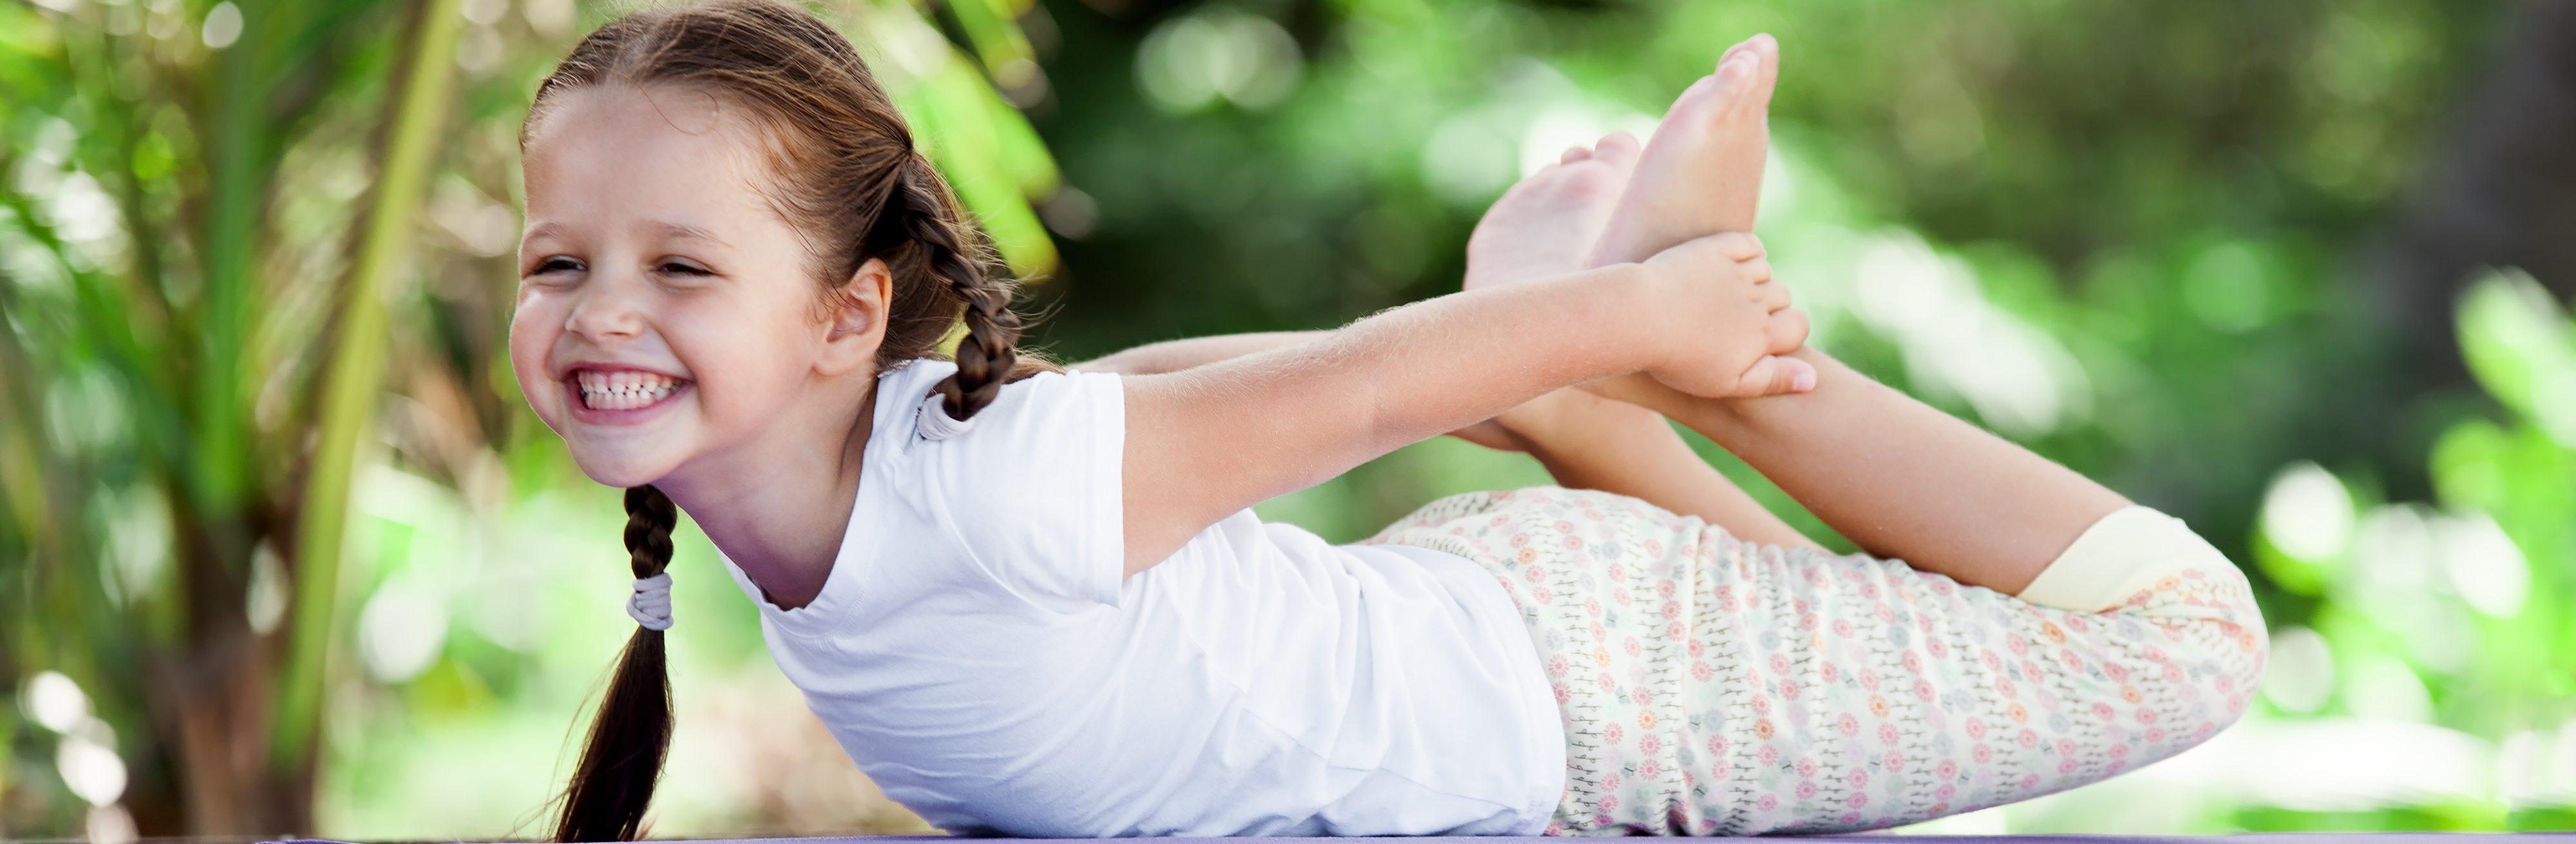 Youth Yoga Pose